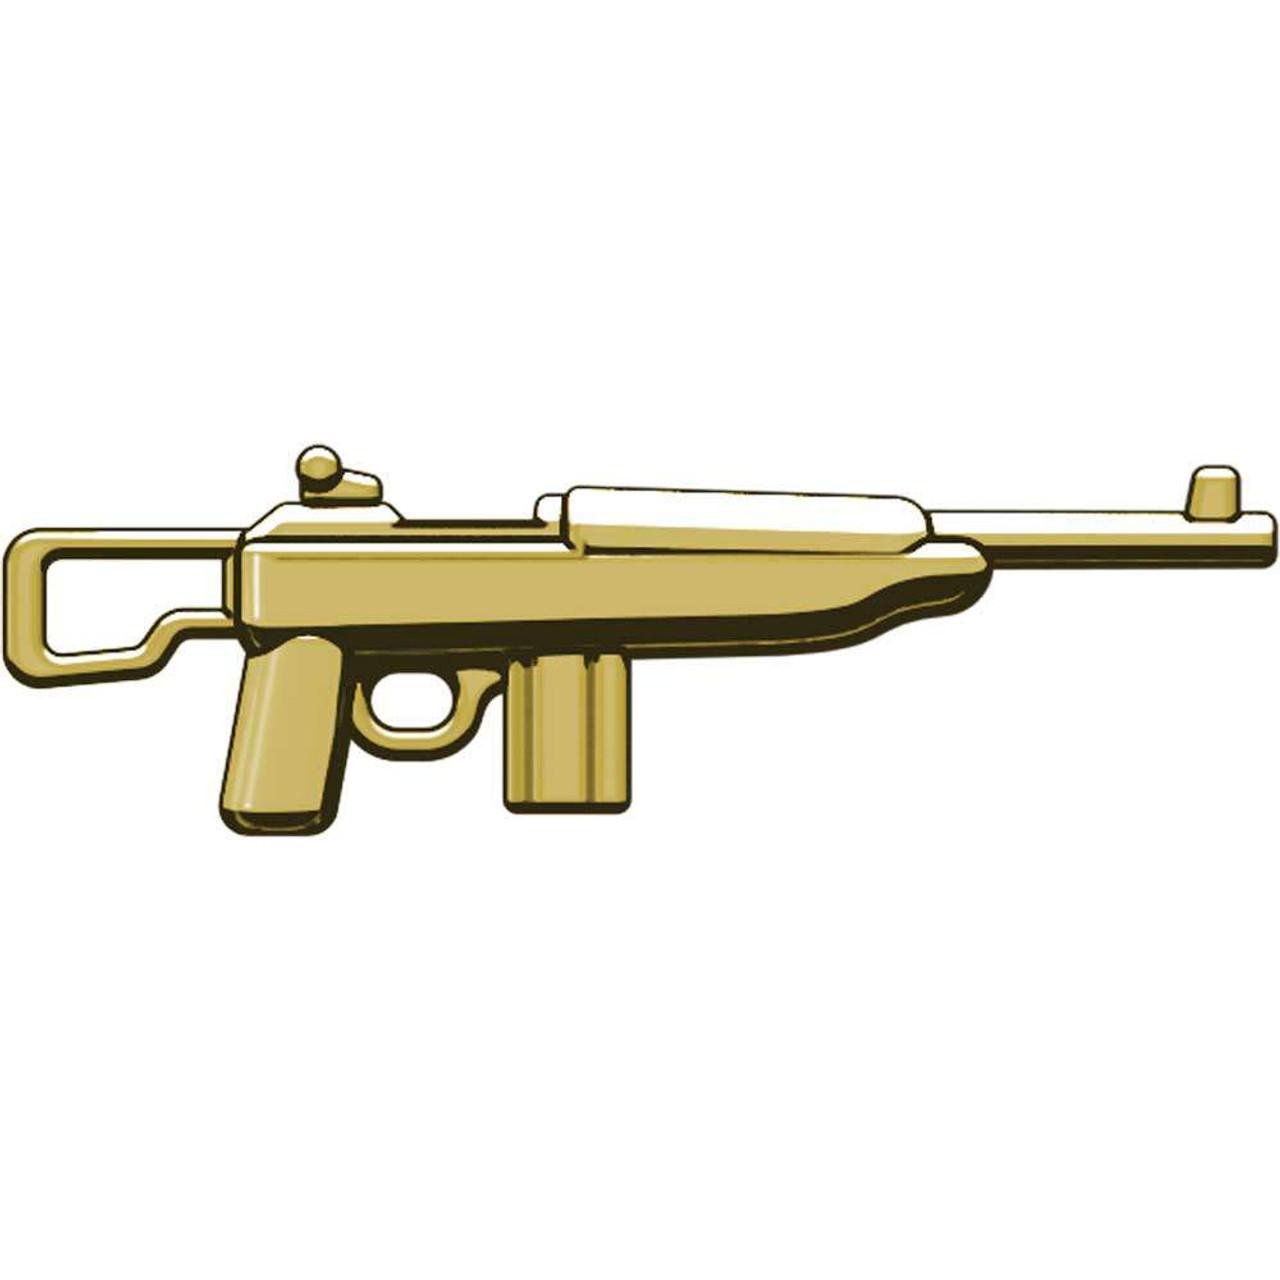 BrickArms M1 Carbine Para 2 5-Inch [Tan]